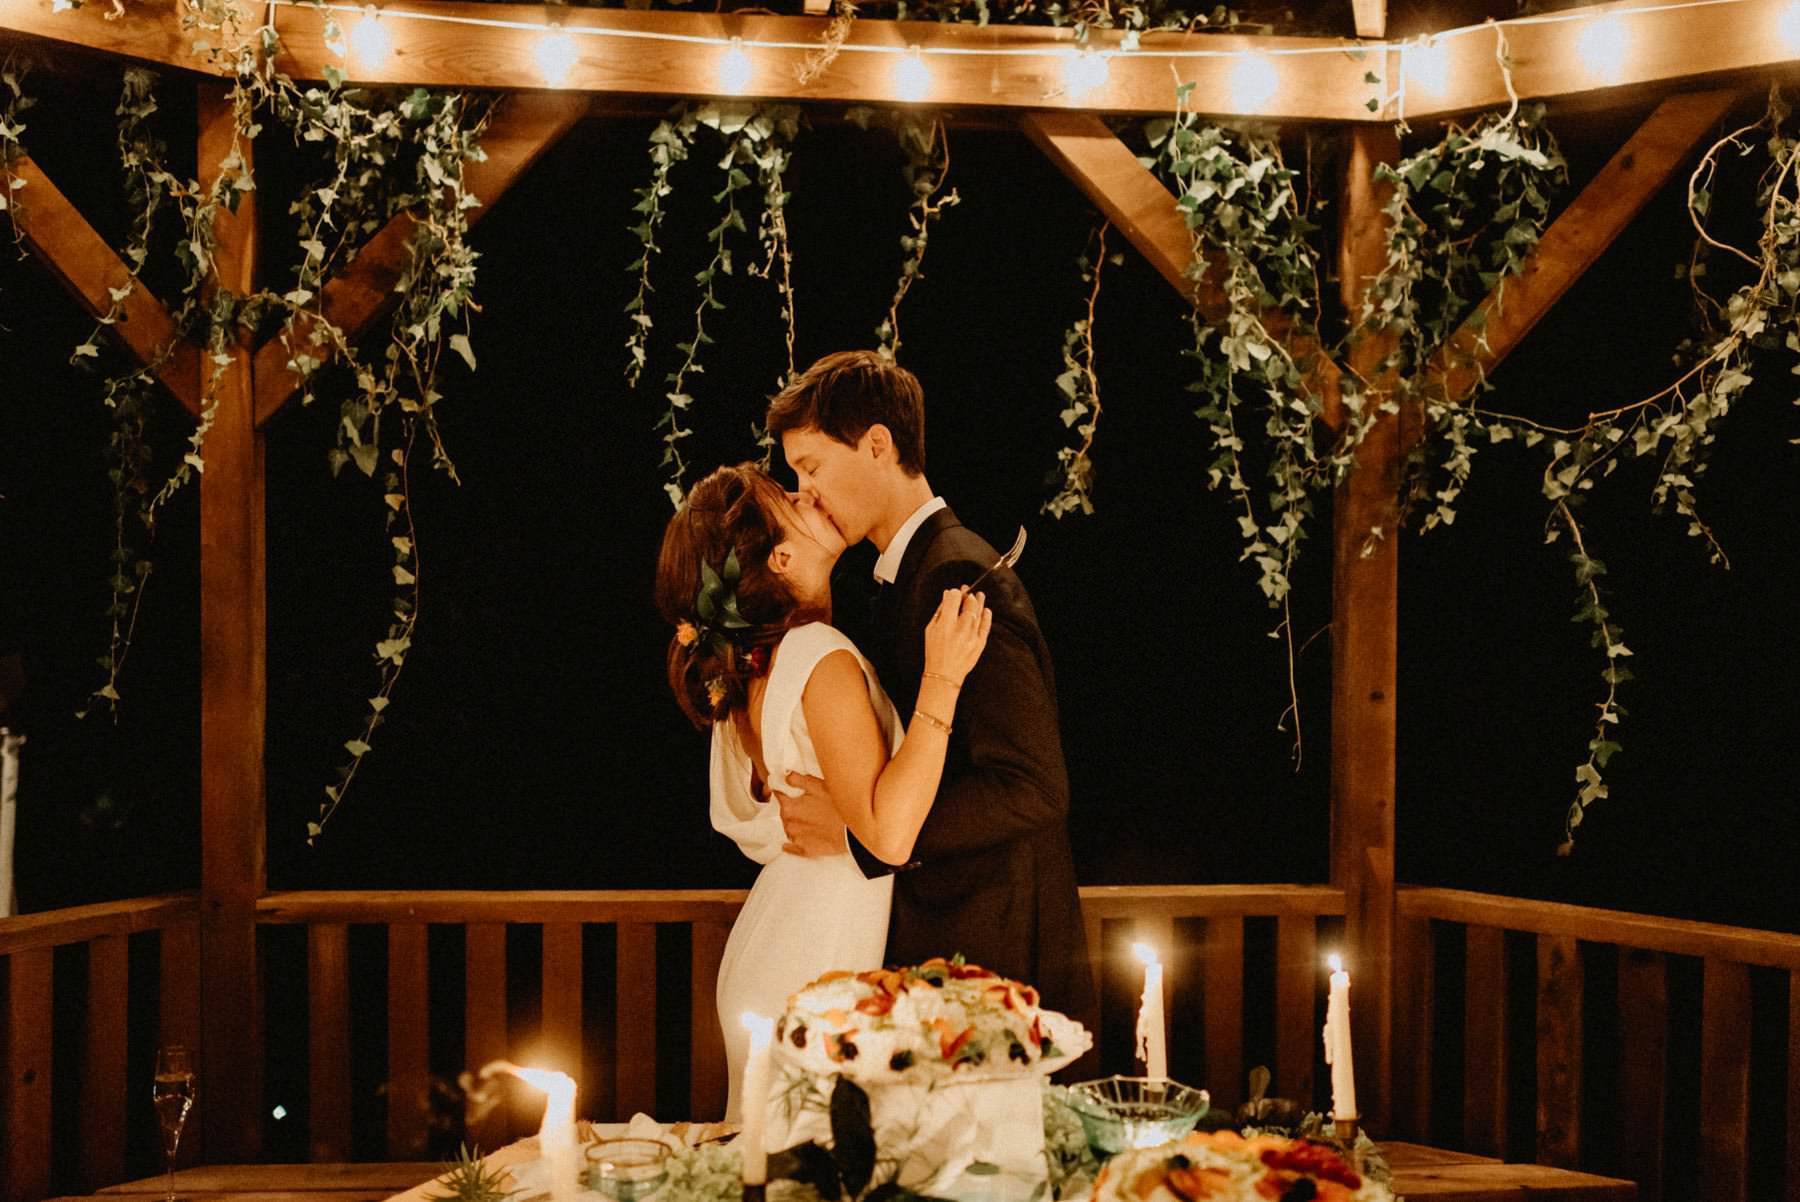 pennsylvania-private-estate-wedding-146.jpg